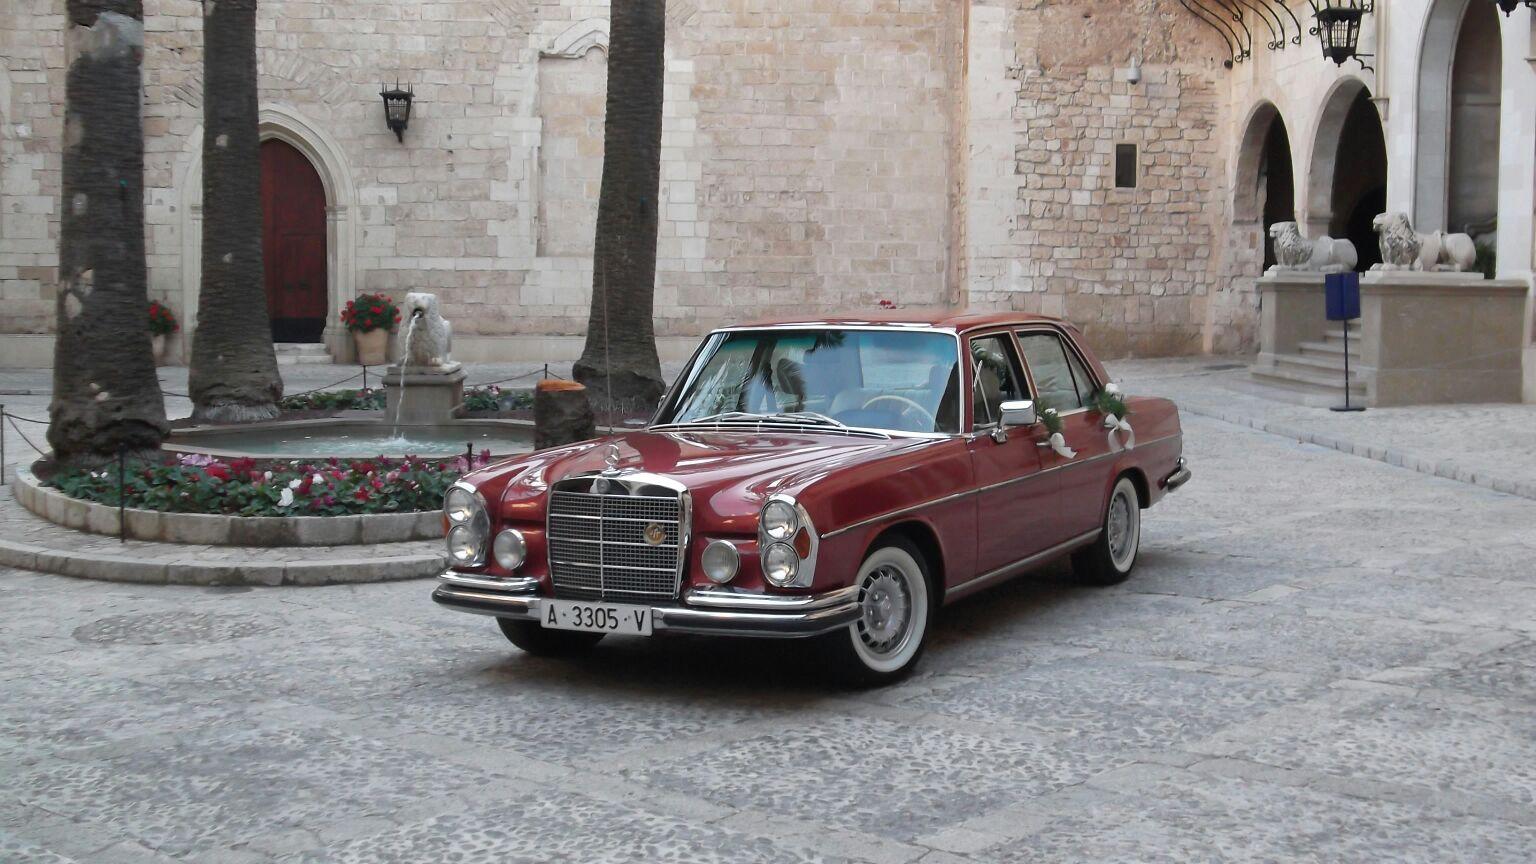 Oldtimer-Mallorca-Oldtimer-mieten-Mallorca-Mercedes-280SE-1972-2